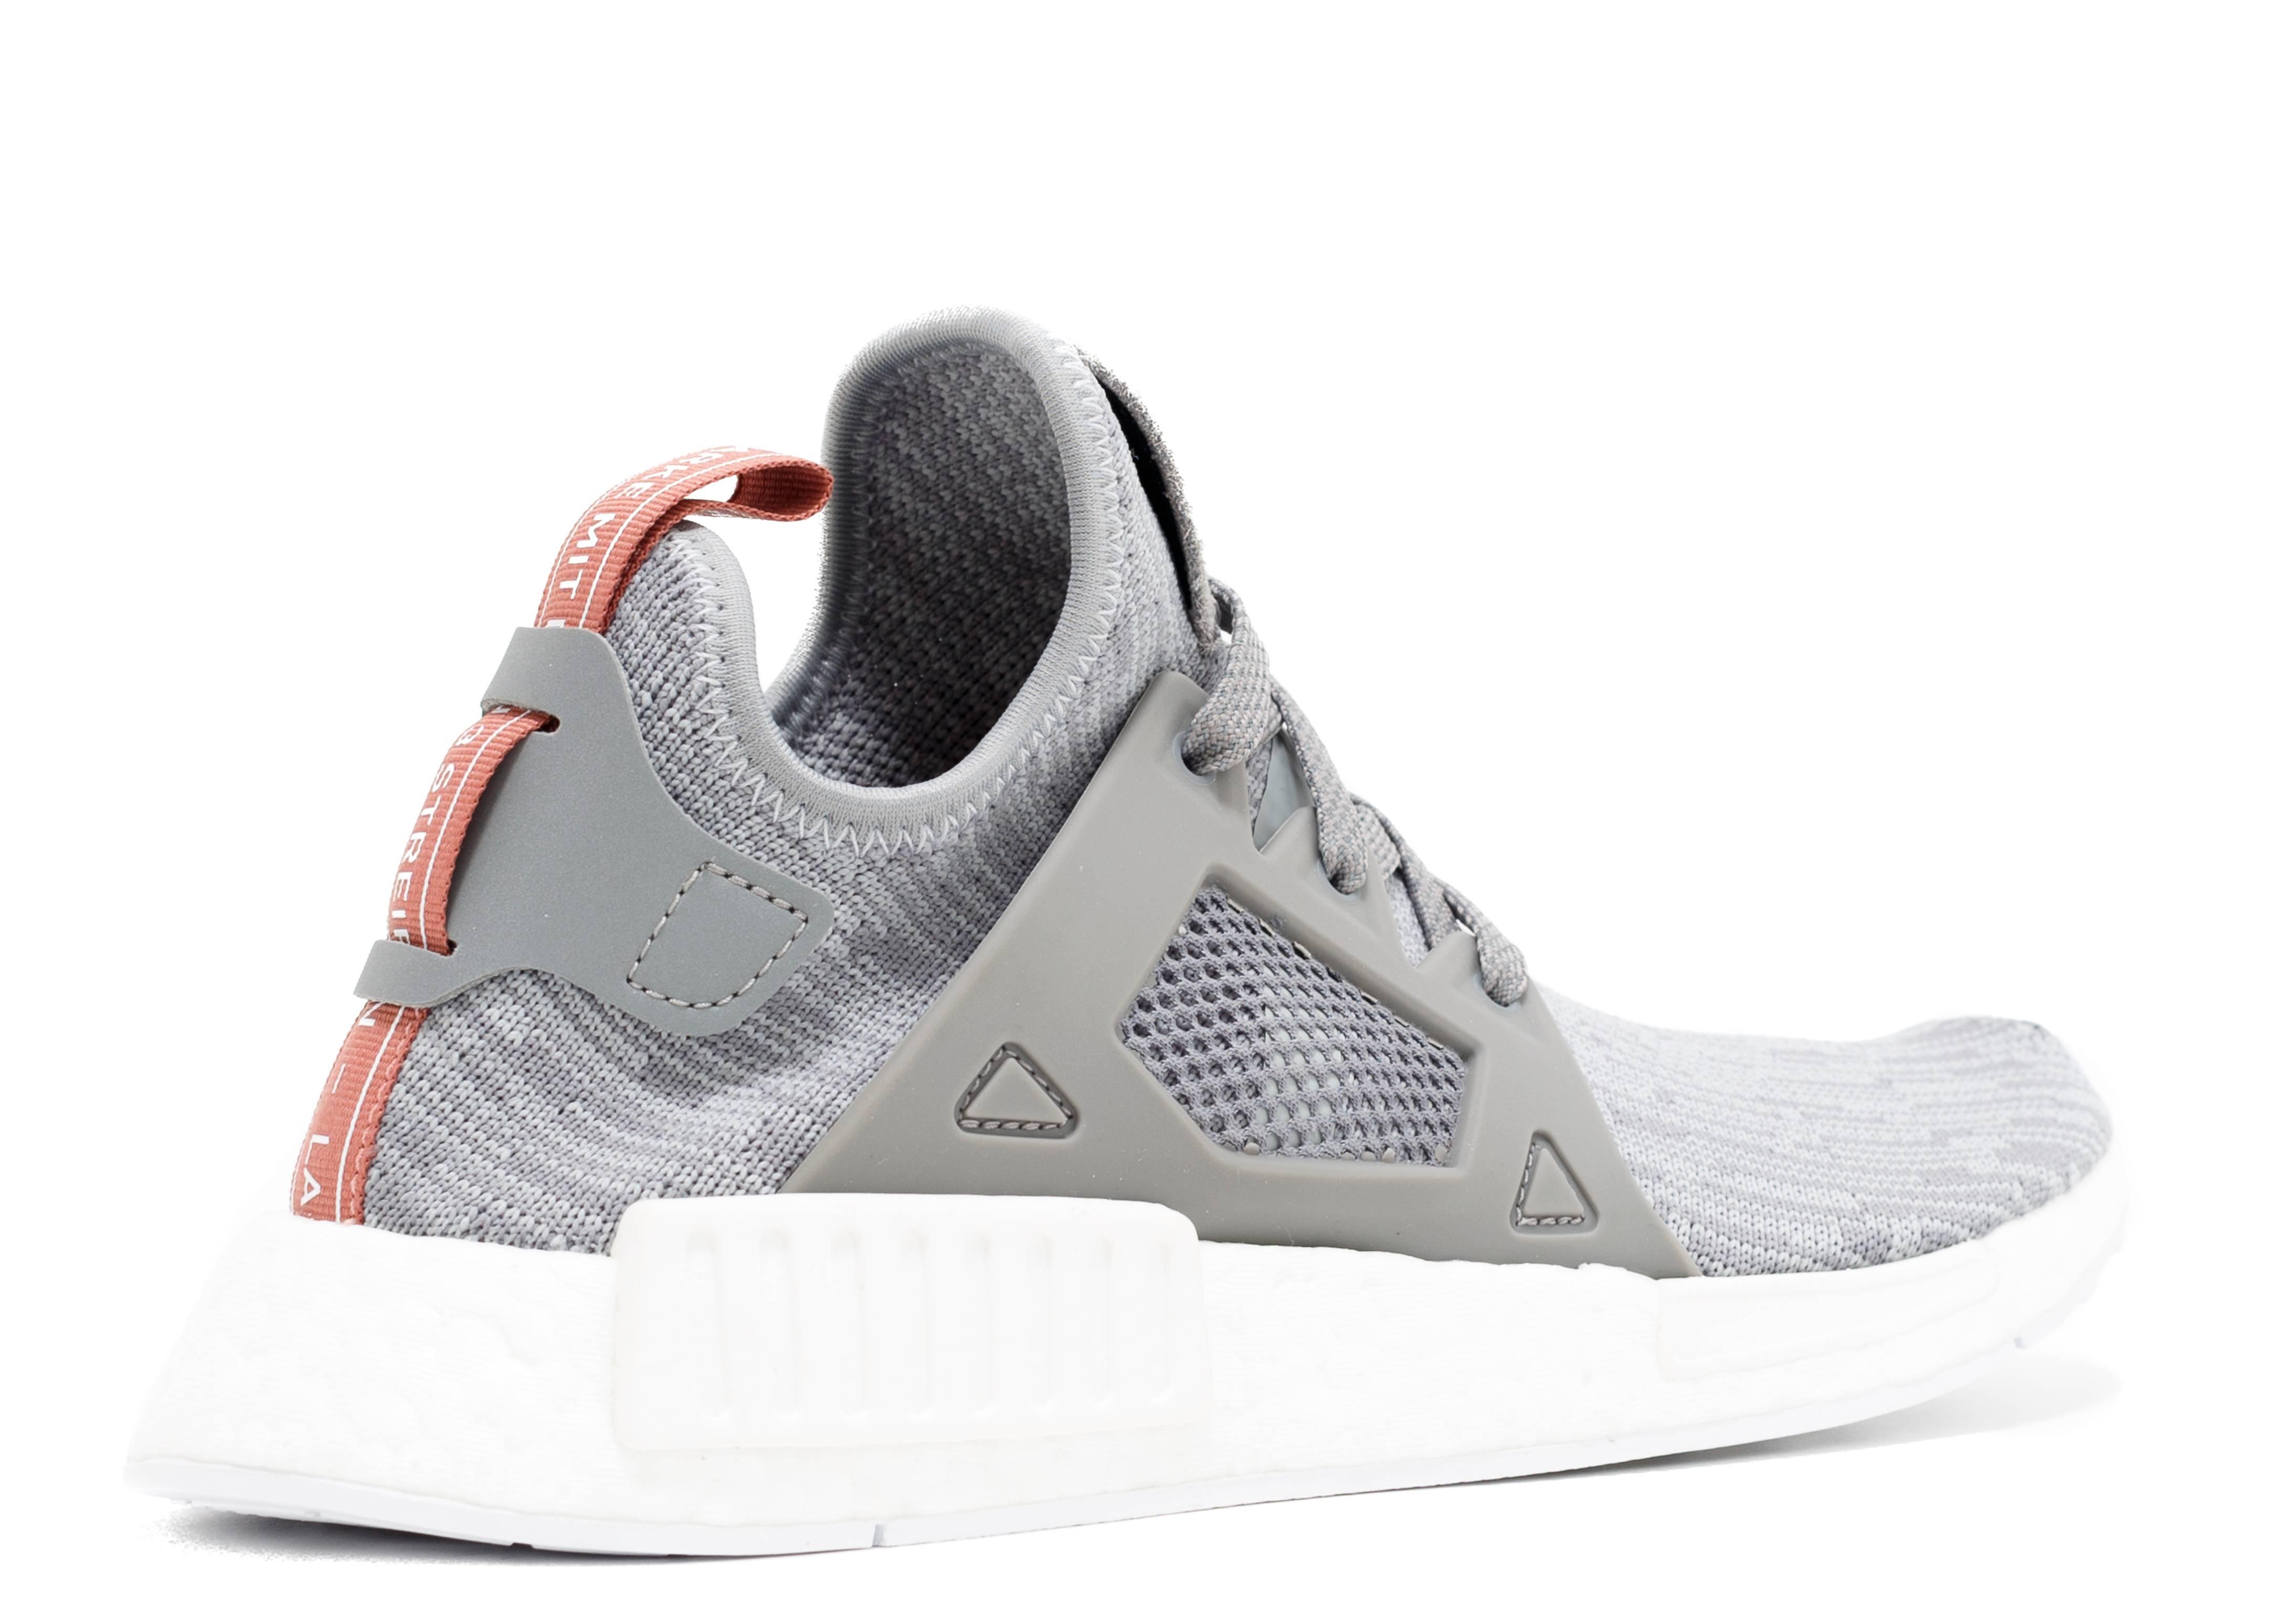 Adidas Nmd Grey Pink